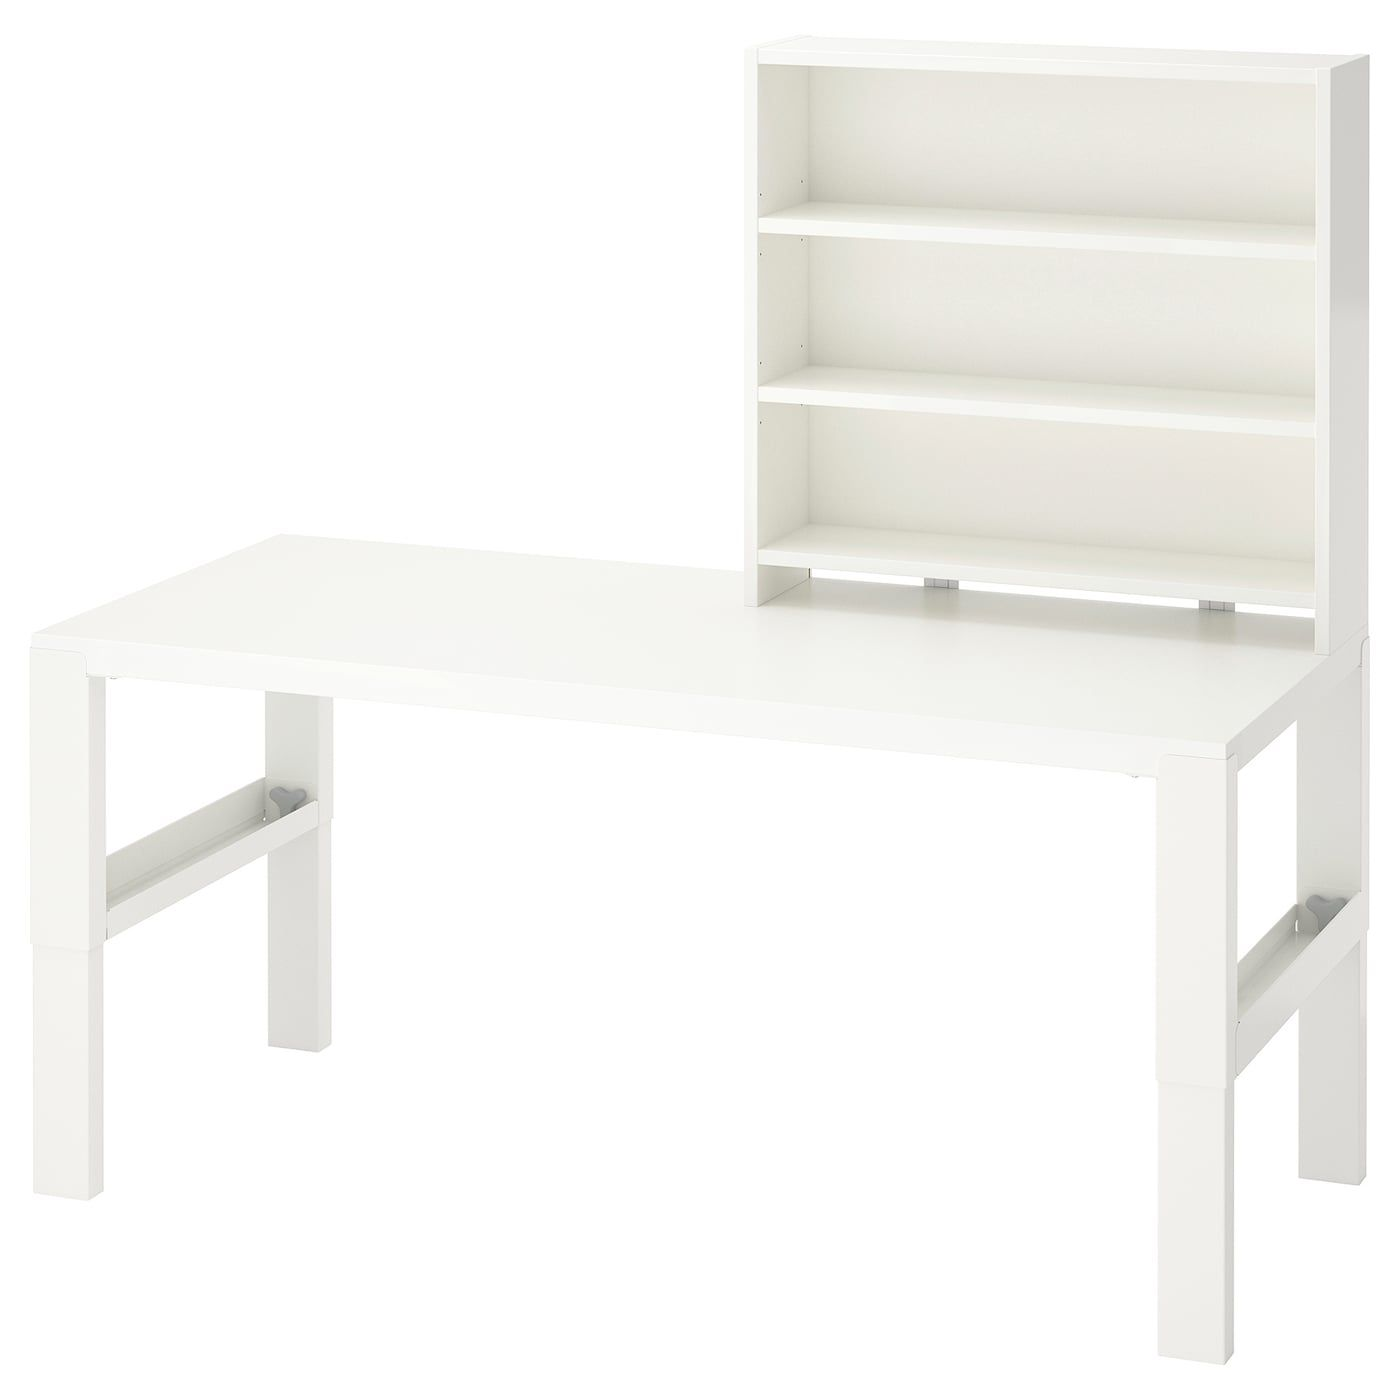 Pahl Stul S Policovym Dilem Bila 128x58 Cm Ikea In 2020 Ikea Desk Shelves Micke Desk